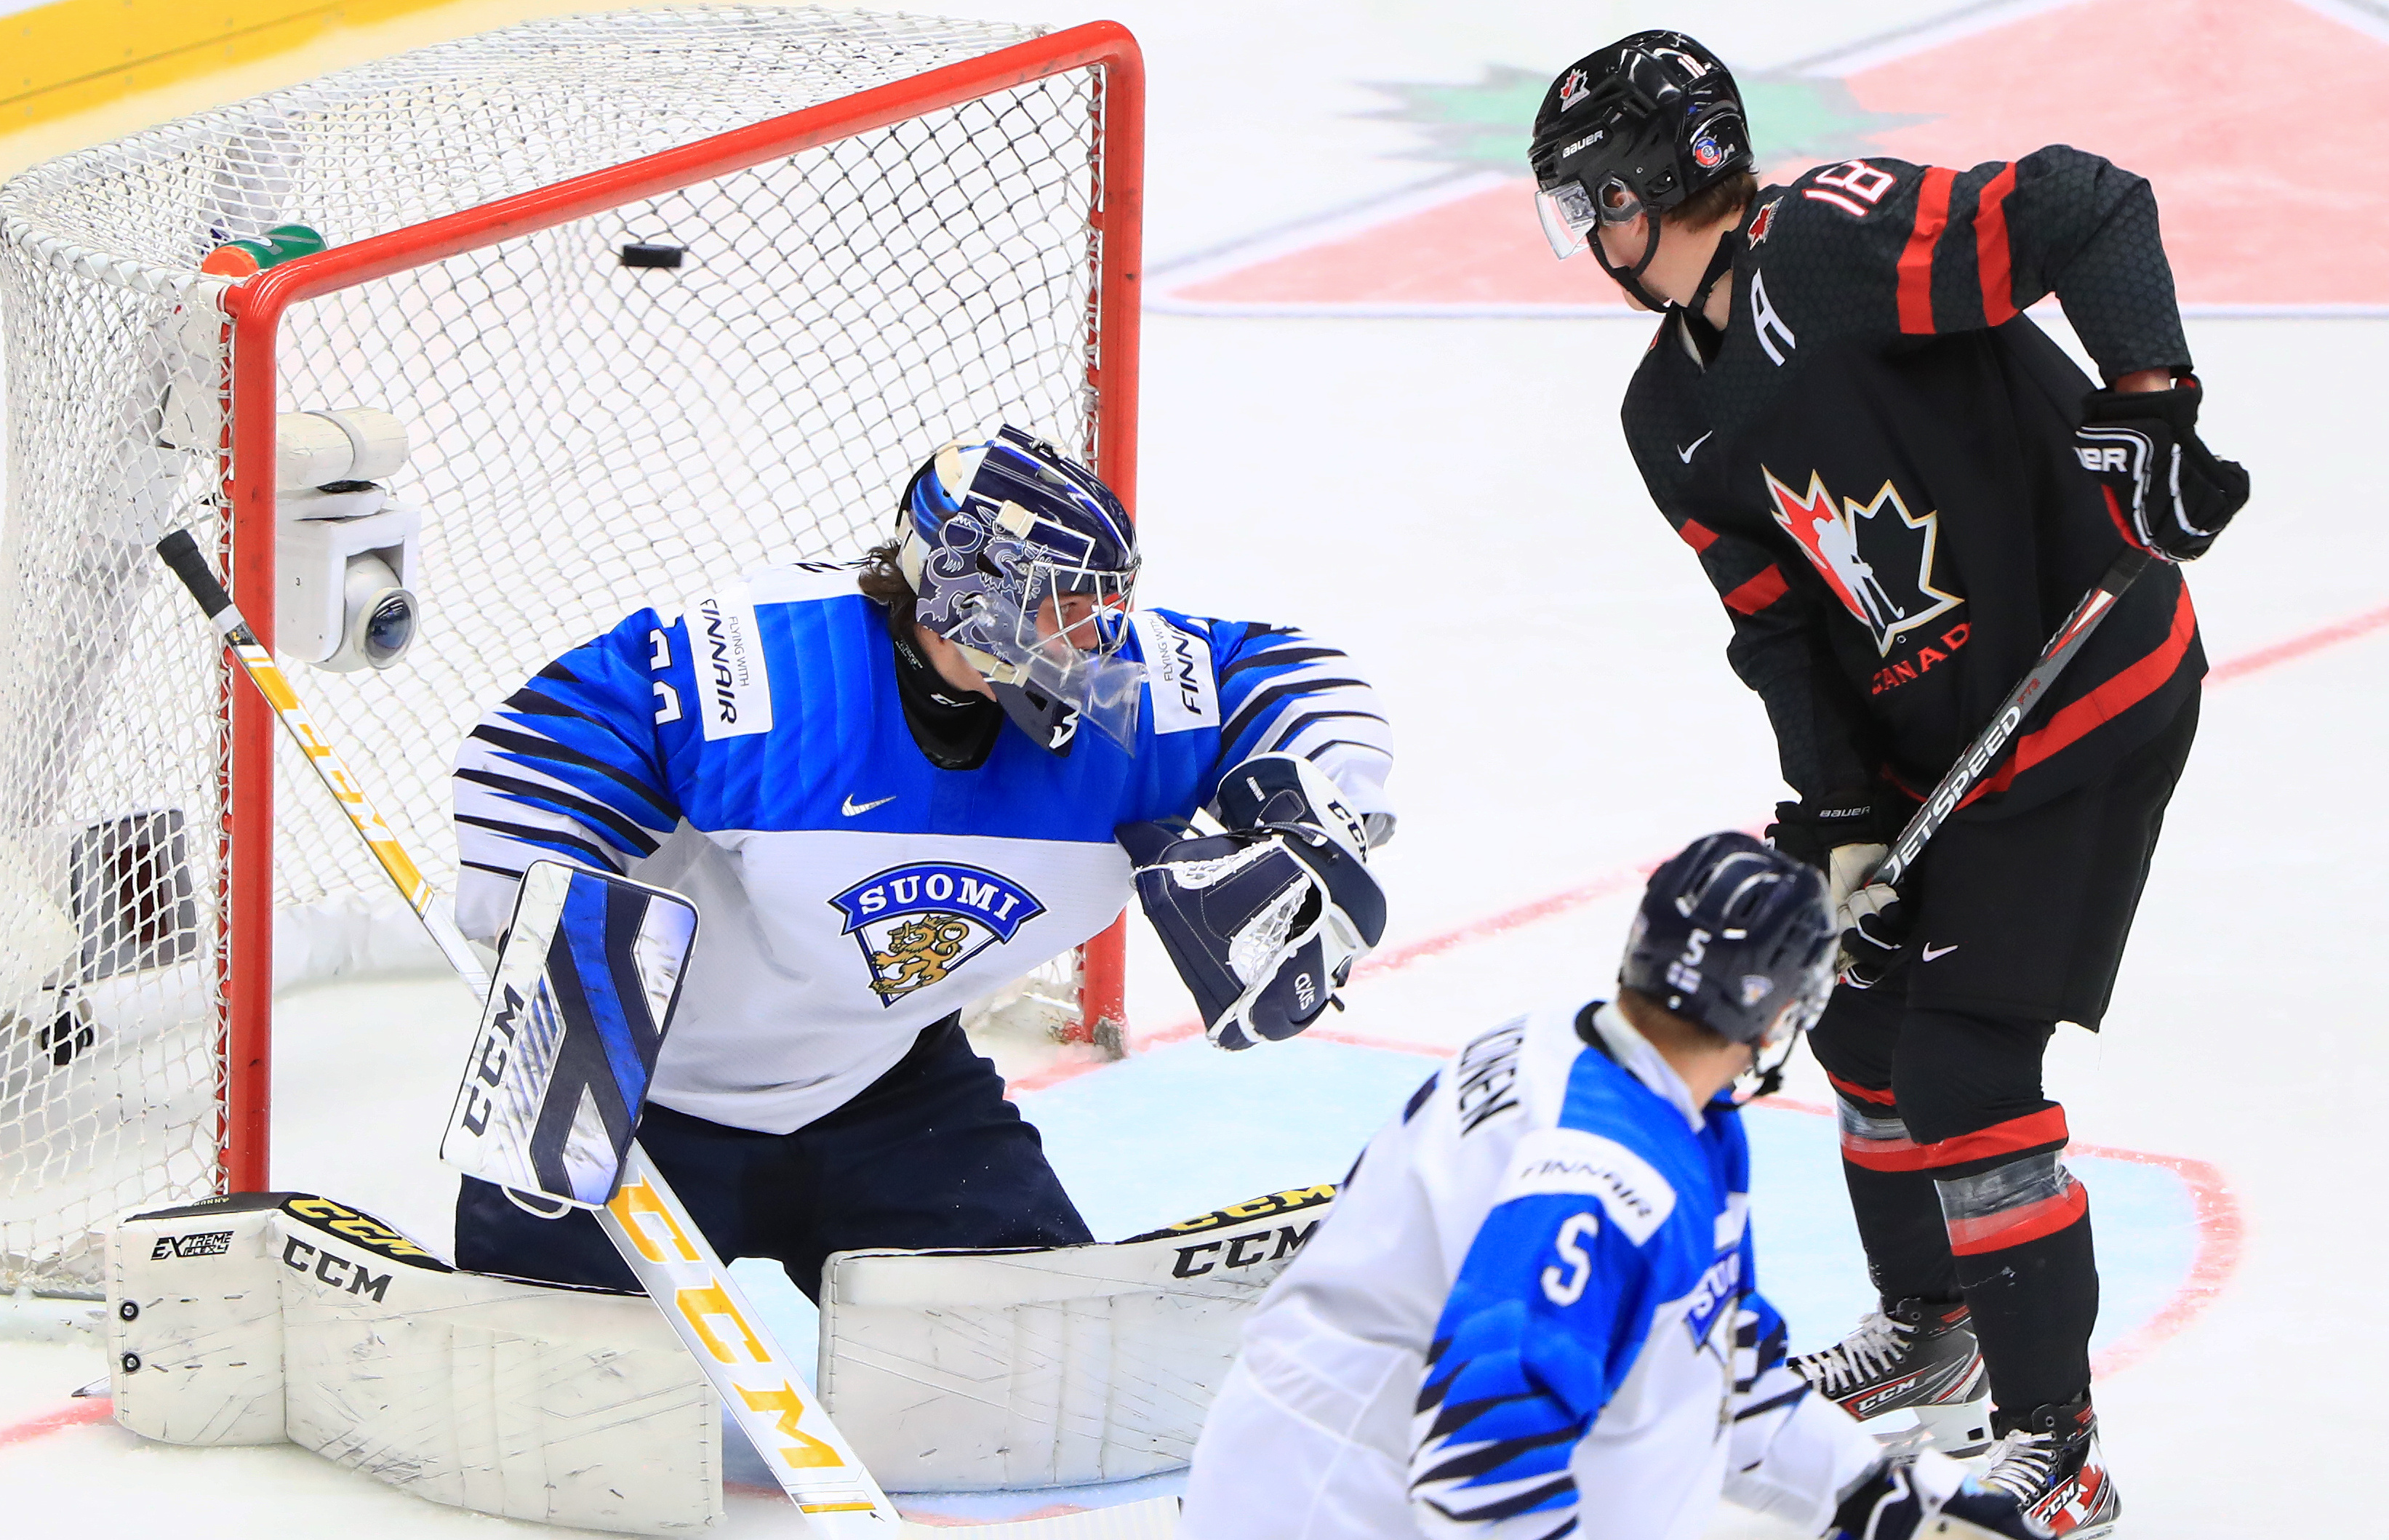 2020 World Junior Ice Hockey Championship, Semifinals: Canada vs Finland